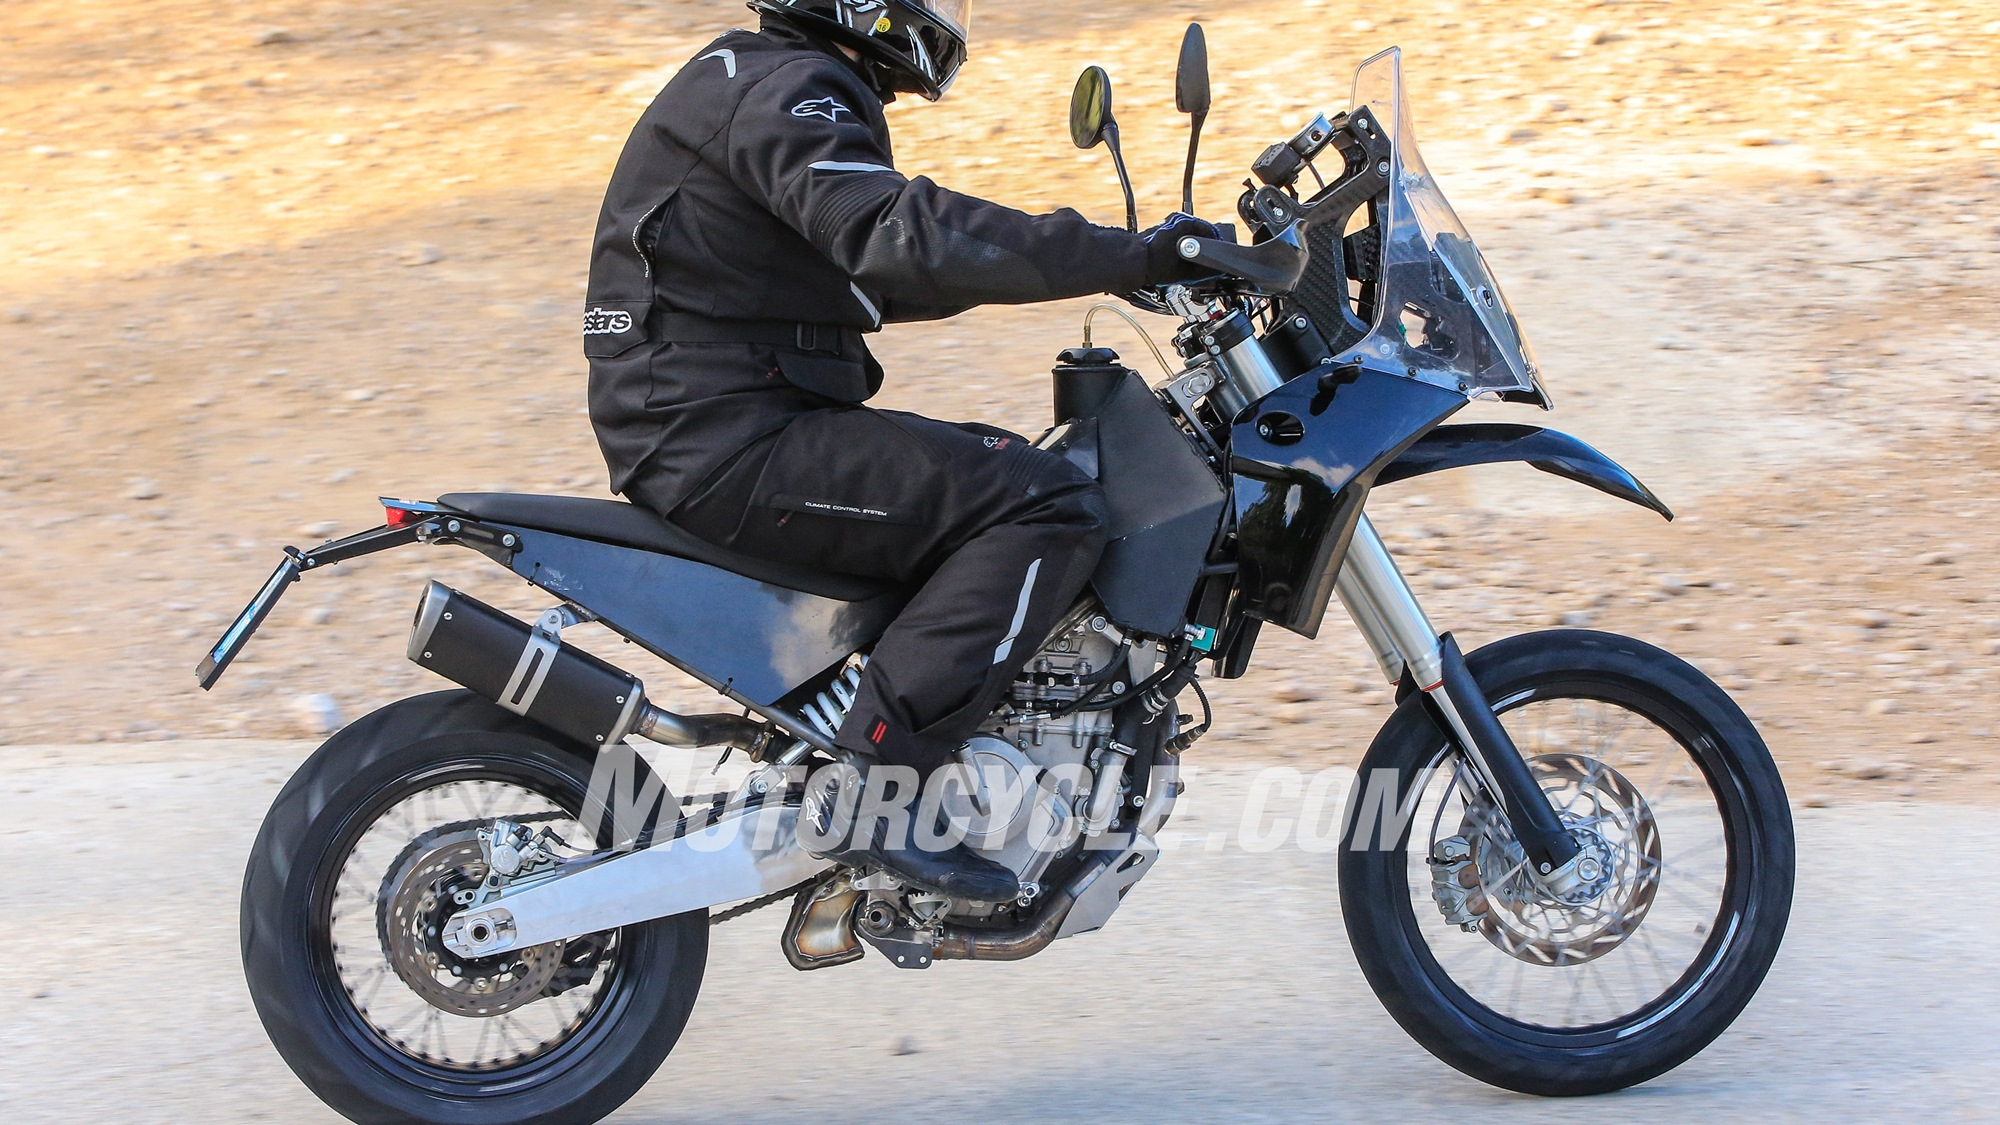 KTM 390 Adventure India launch in 2019 confirmed